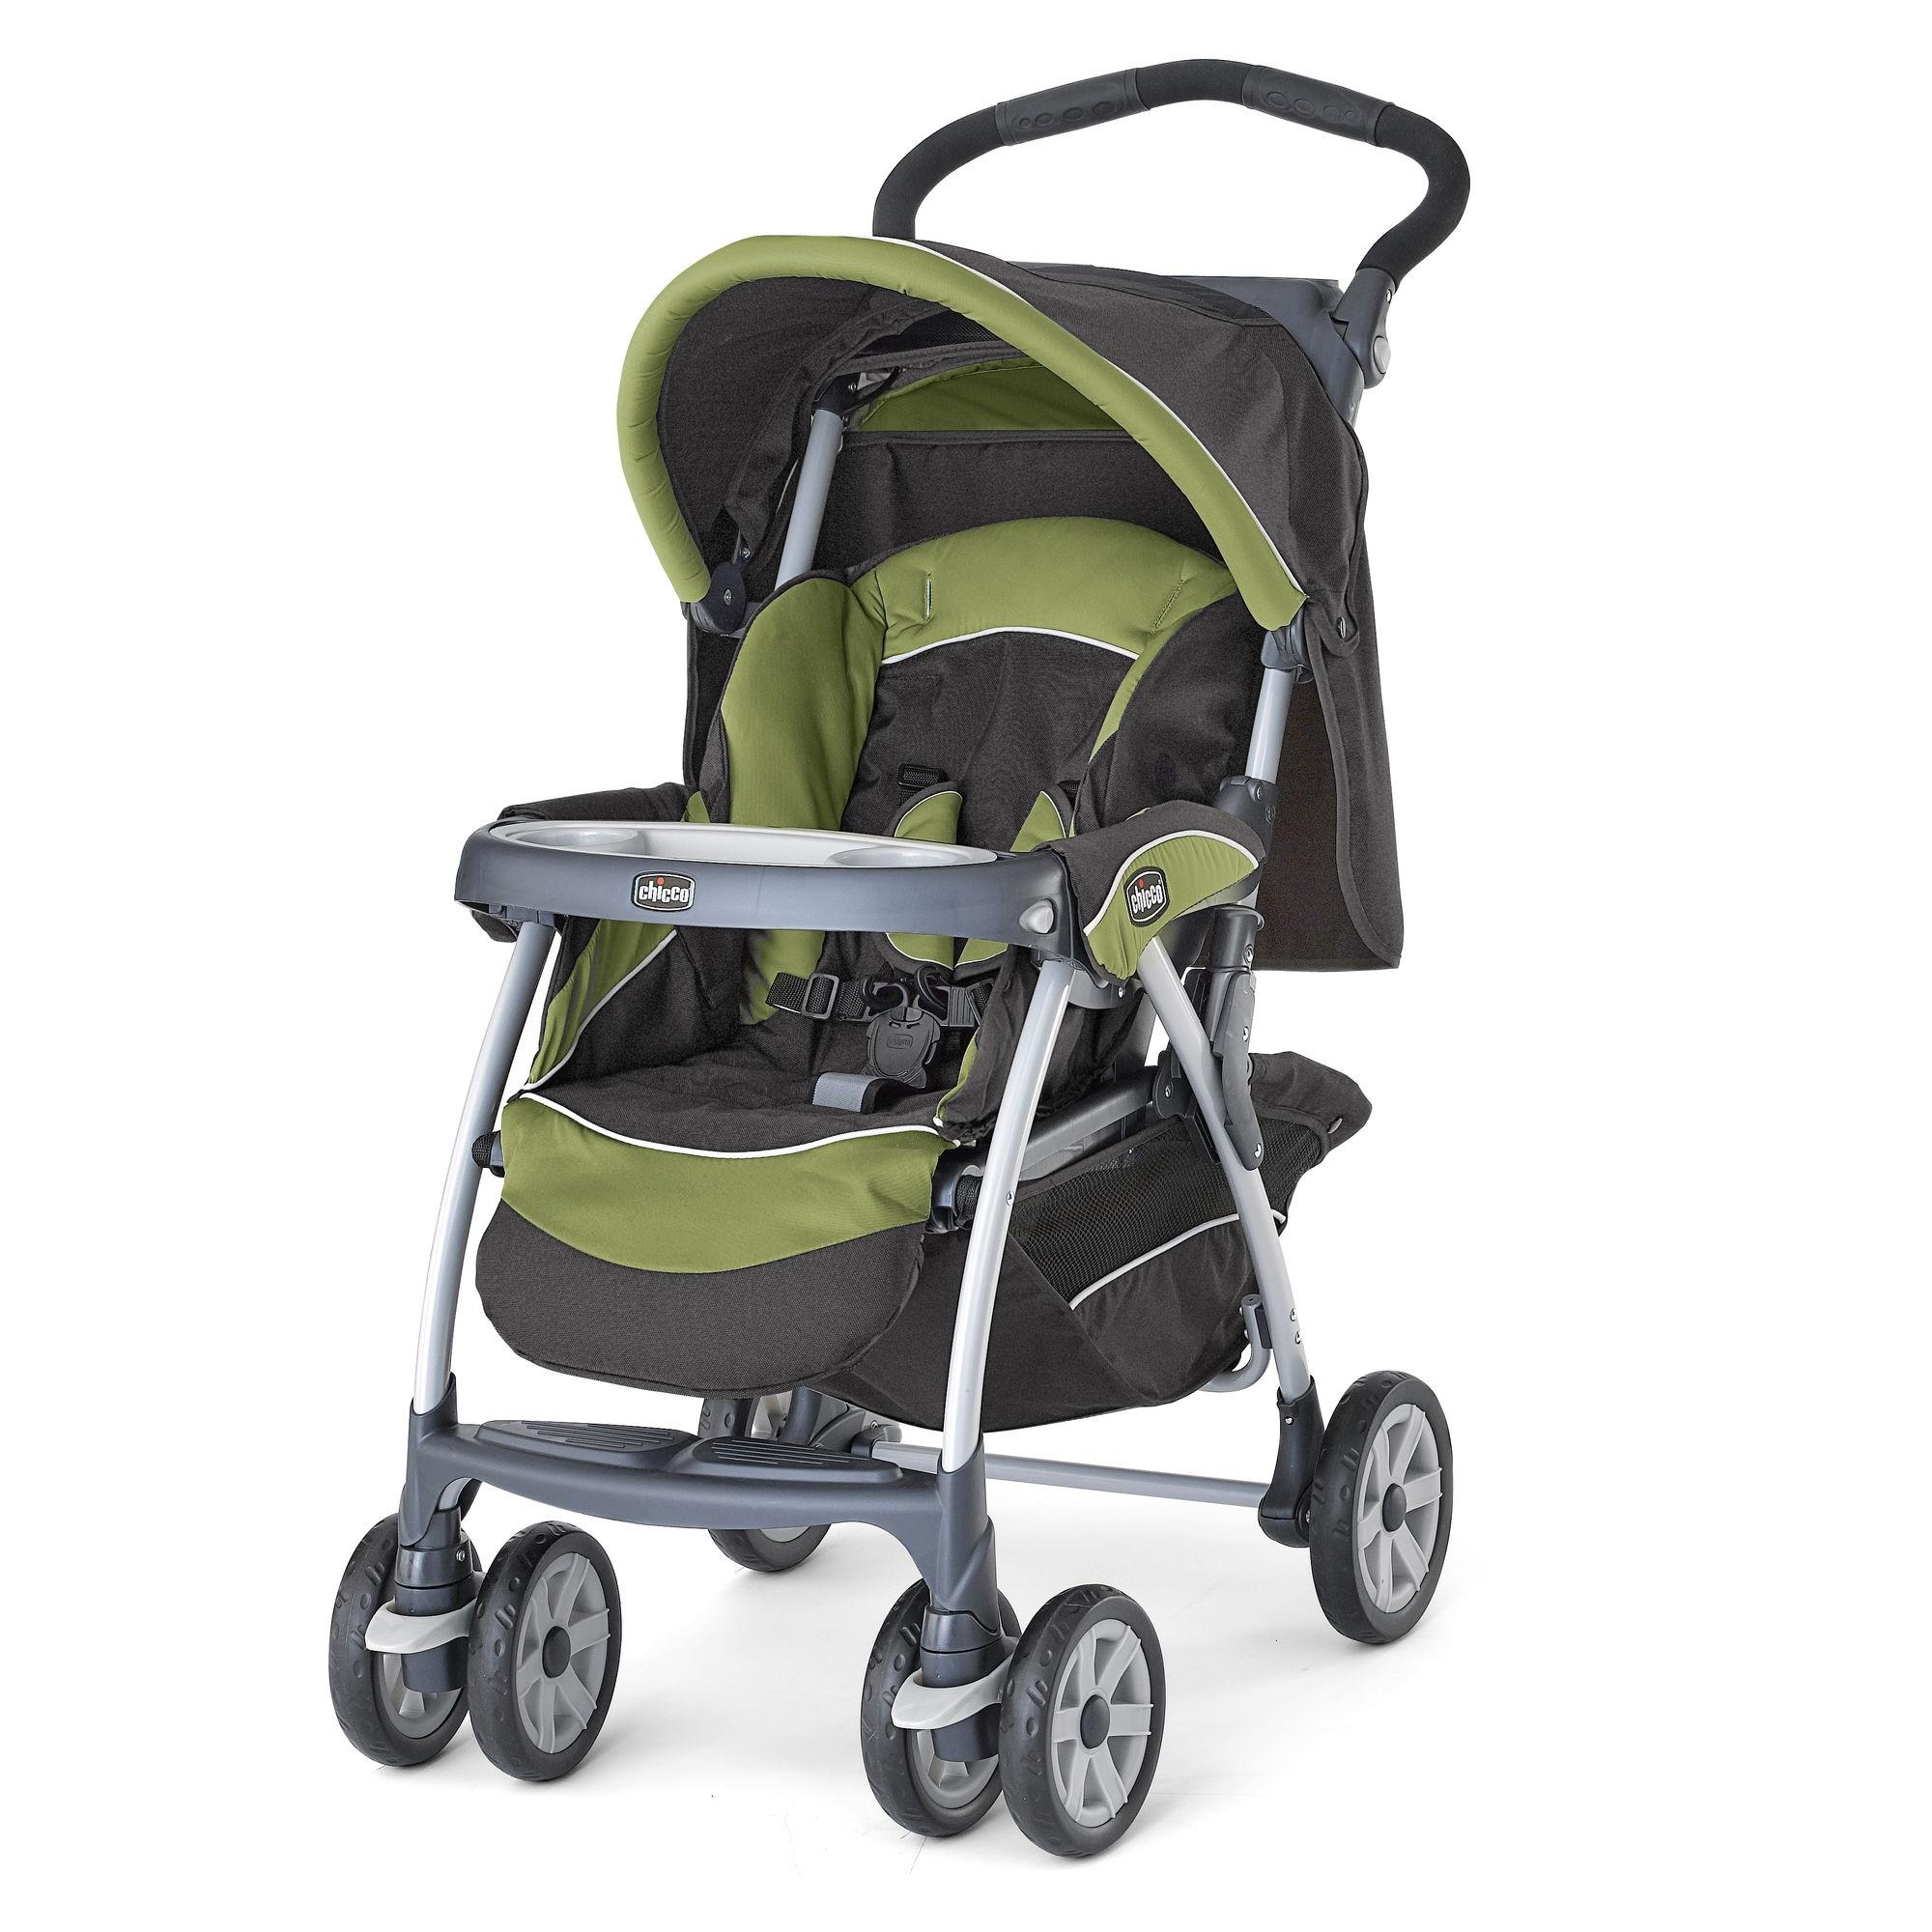 Chicco Cortina® Stroller